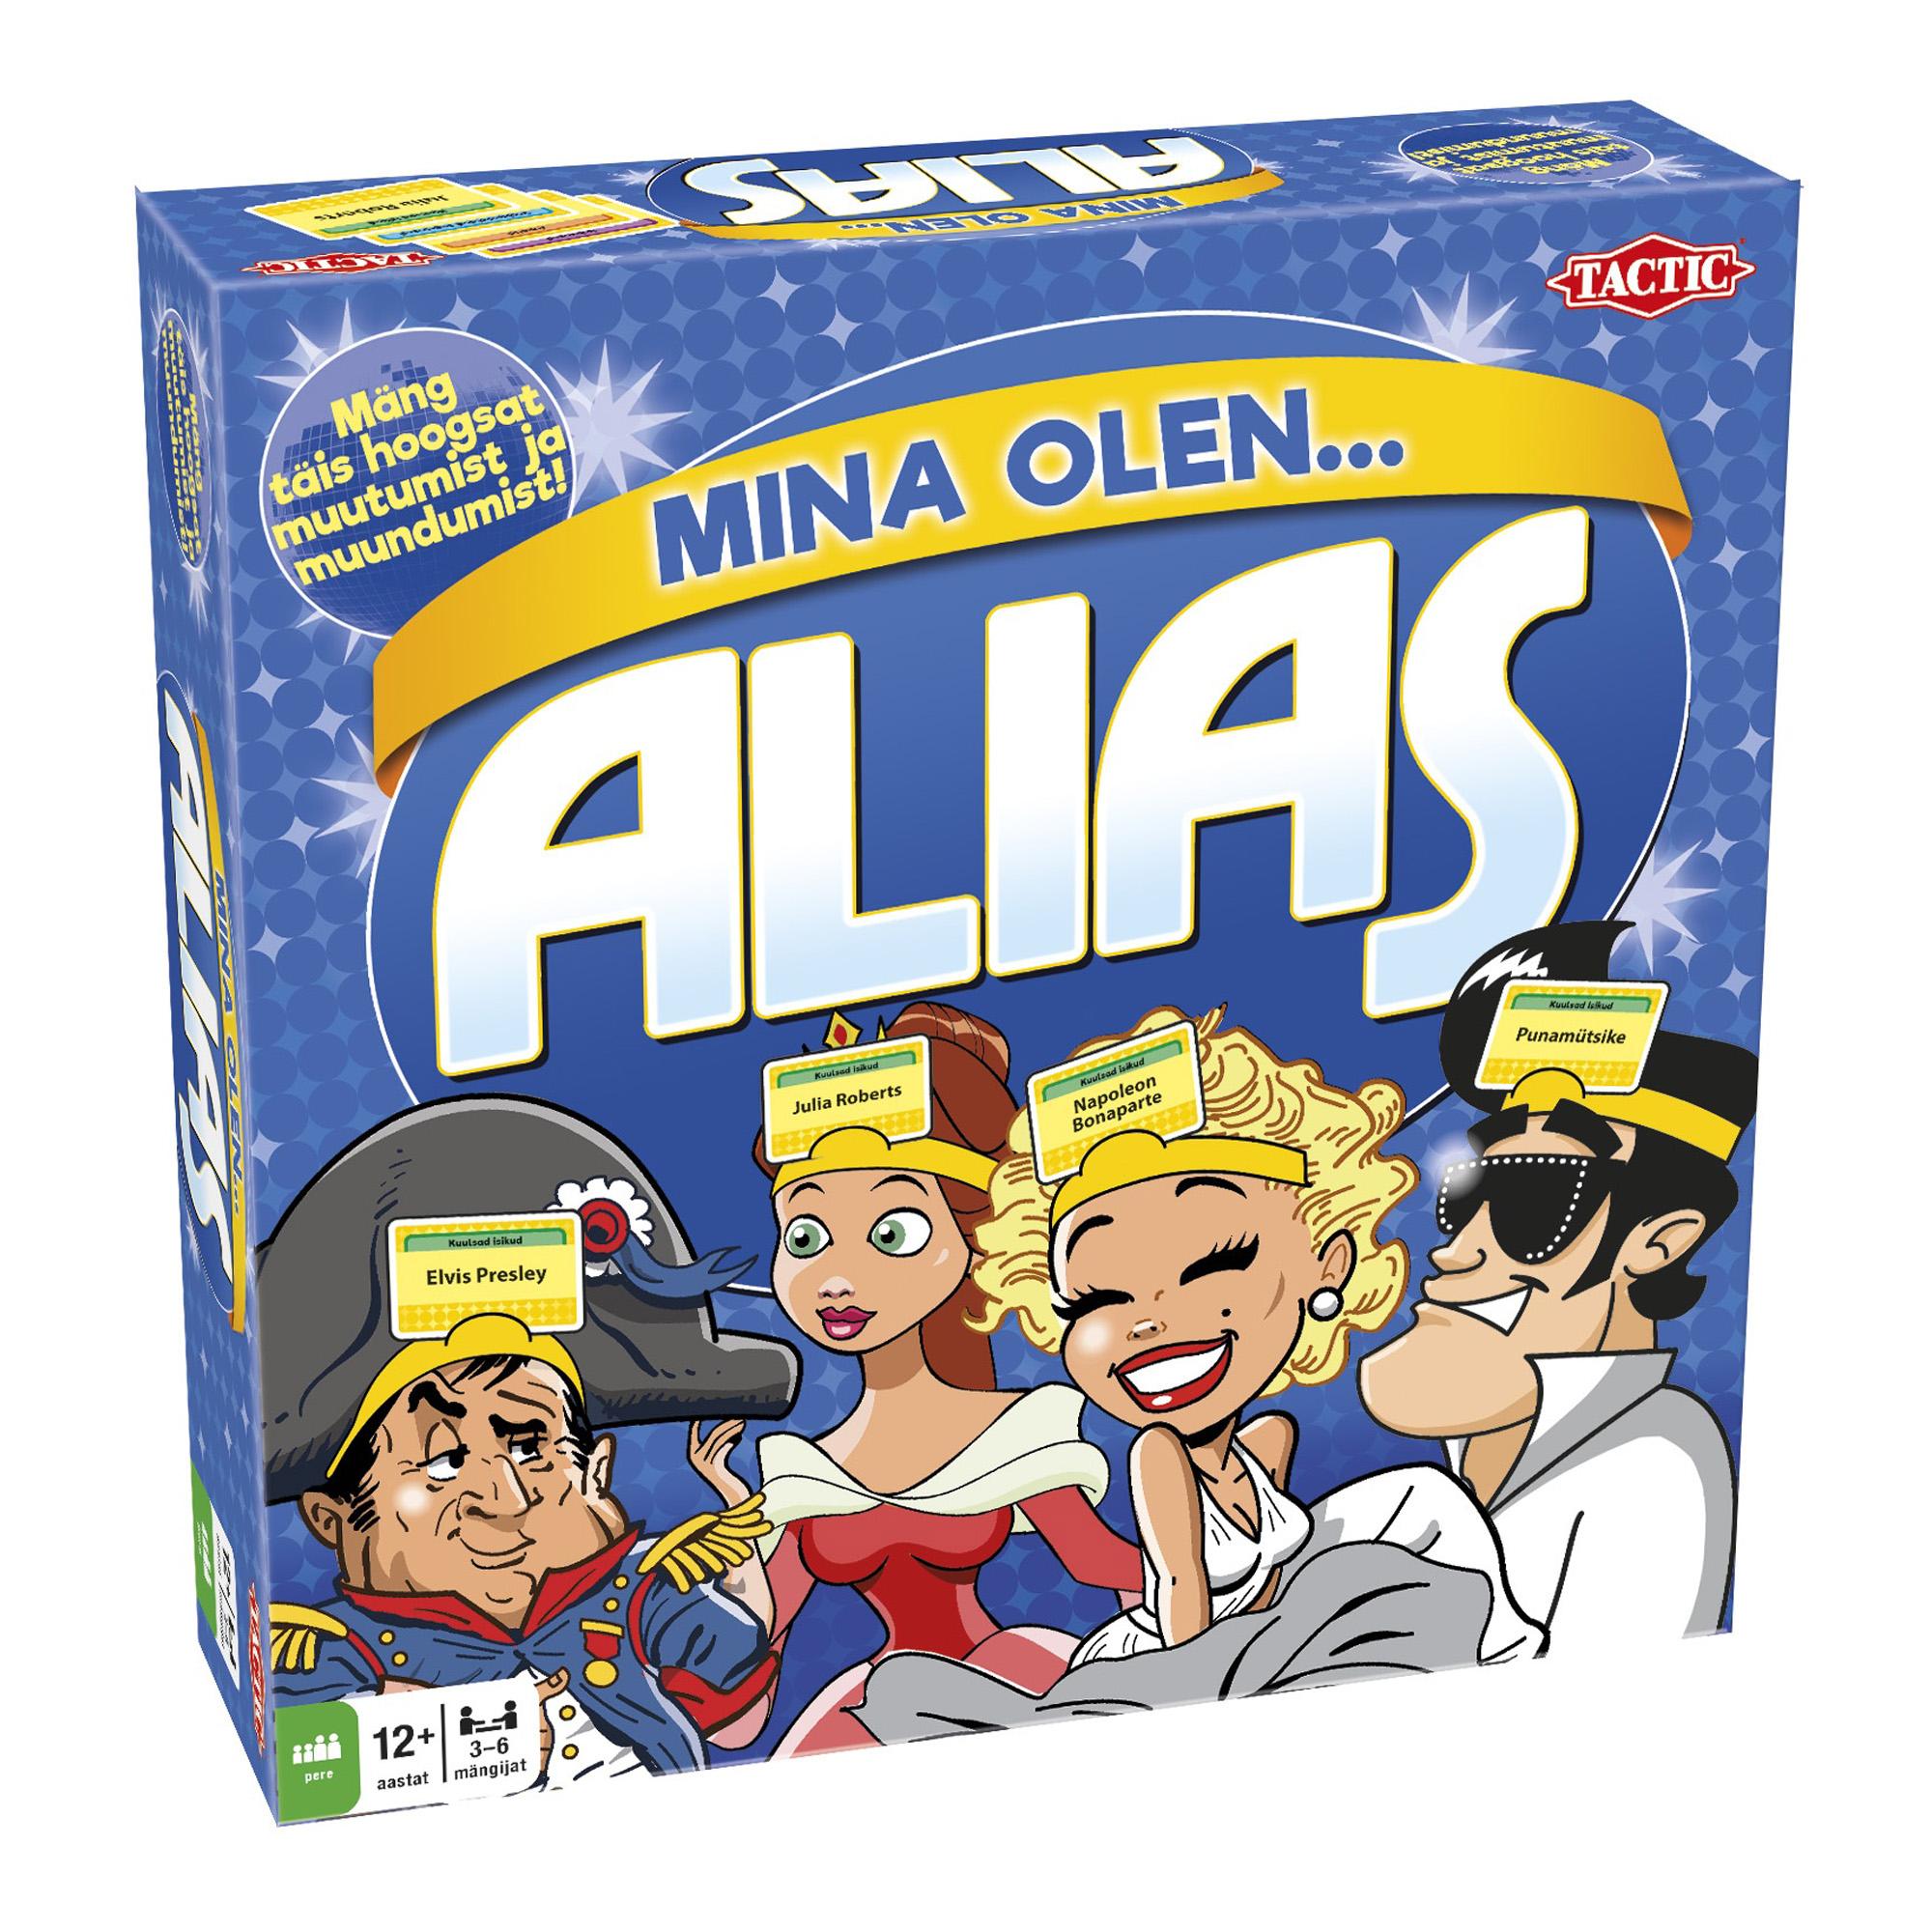 Mina olen Alias